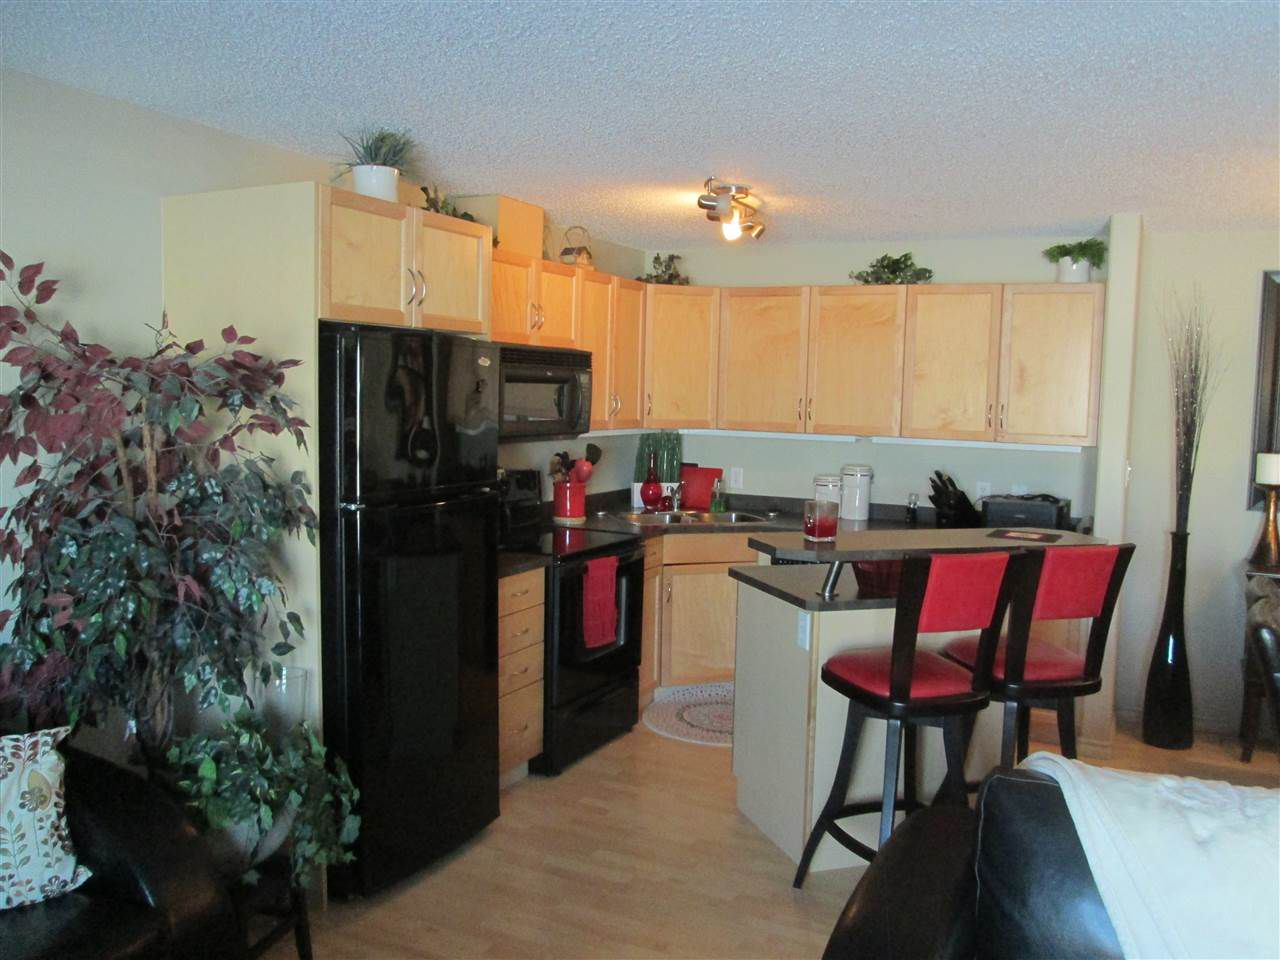 Main Photo: 416 646 MCALLISTER Loop in Edmonton: Zone 55 Condo for sale : MLS®# E4137442